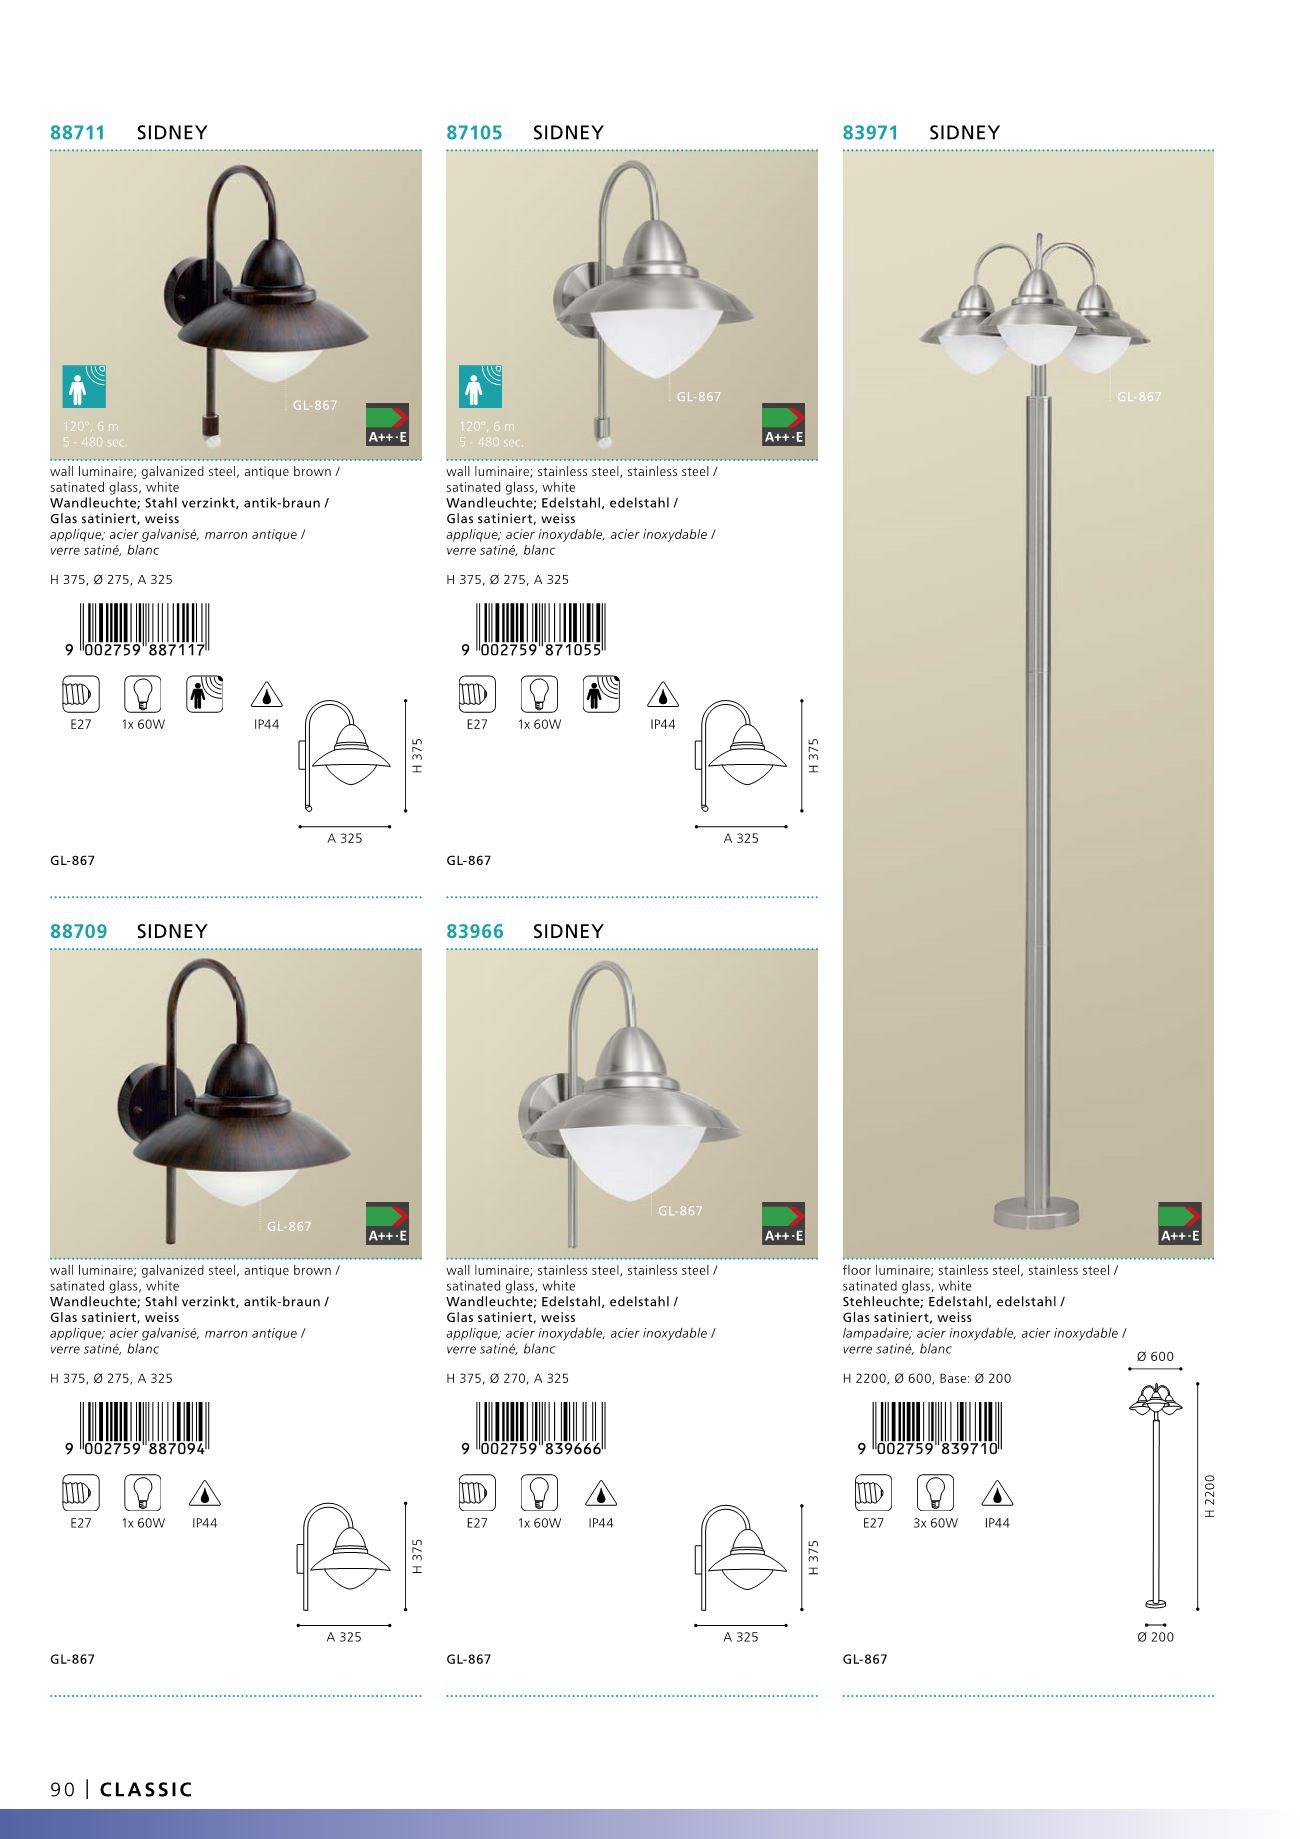 venkovn lampa stojac sidney eglo 83971. Black Bedroom Furniture Sets. Home Design Ideas